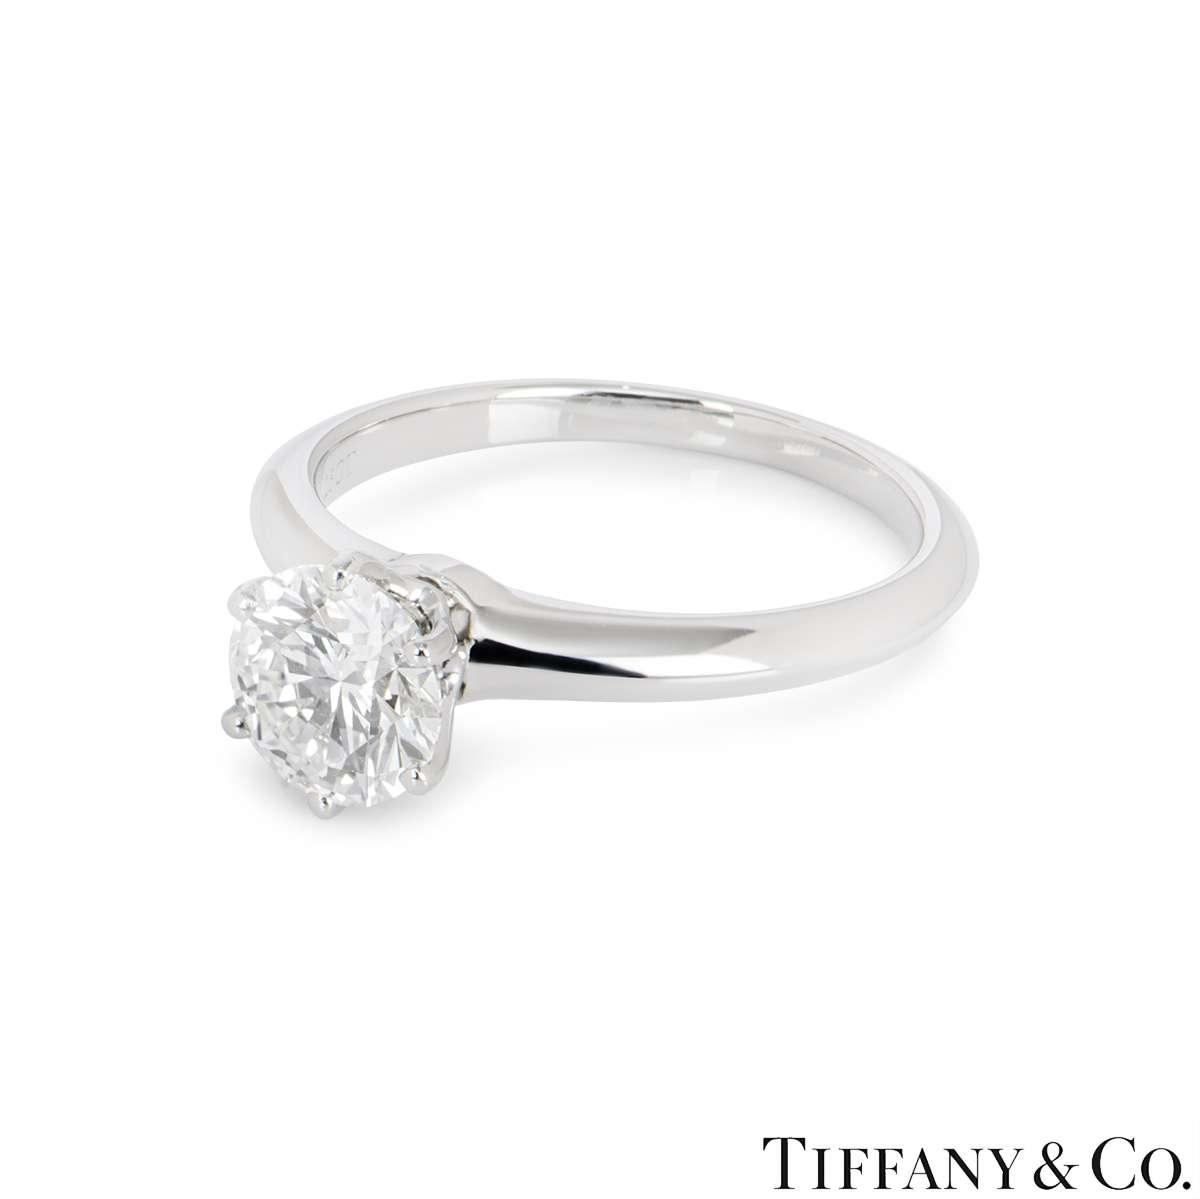 Tiffany & Co. Platinum Diamond Setting Ring 1.25ct H/VS1 XXX